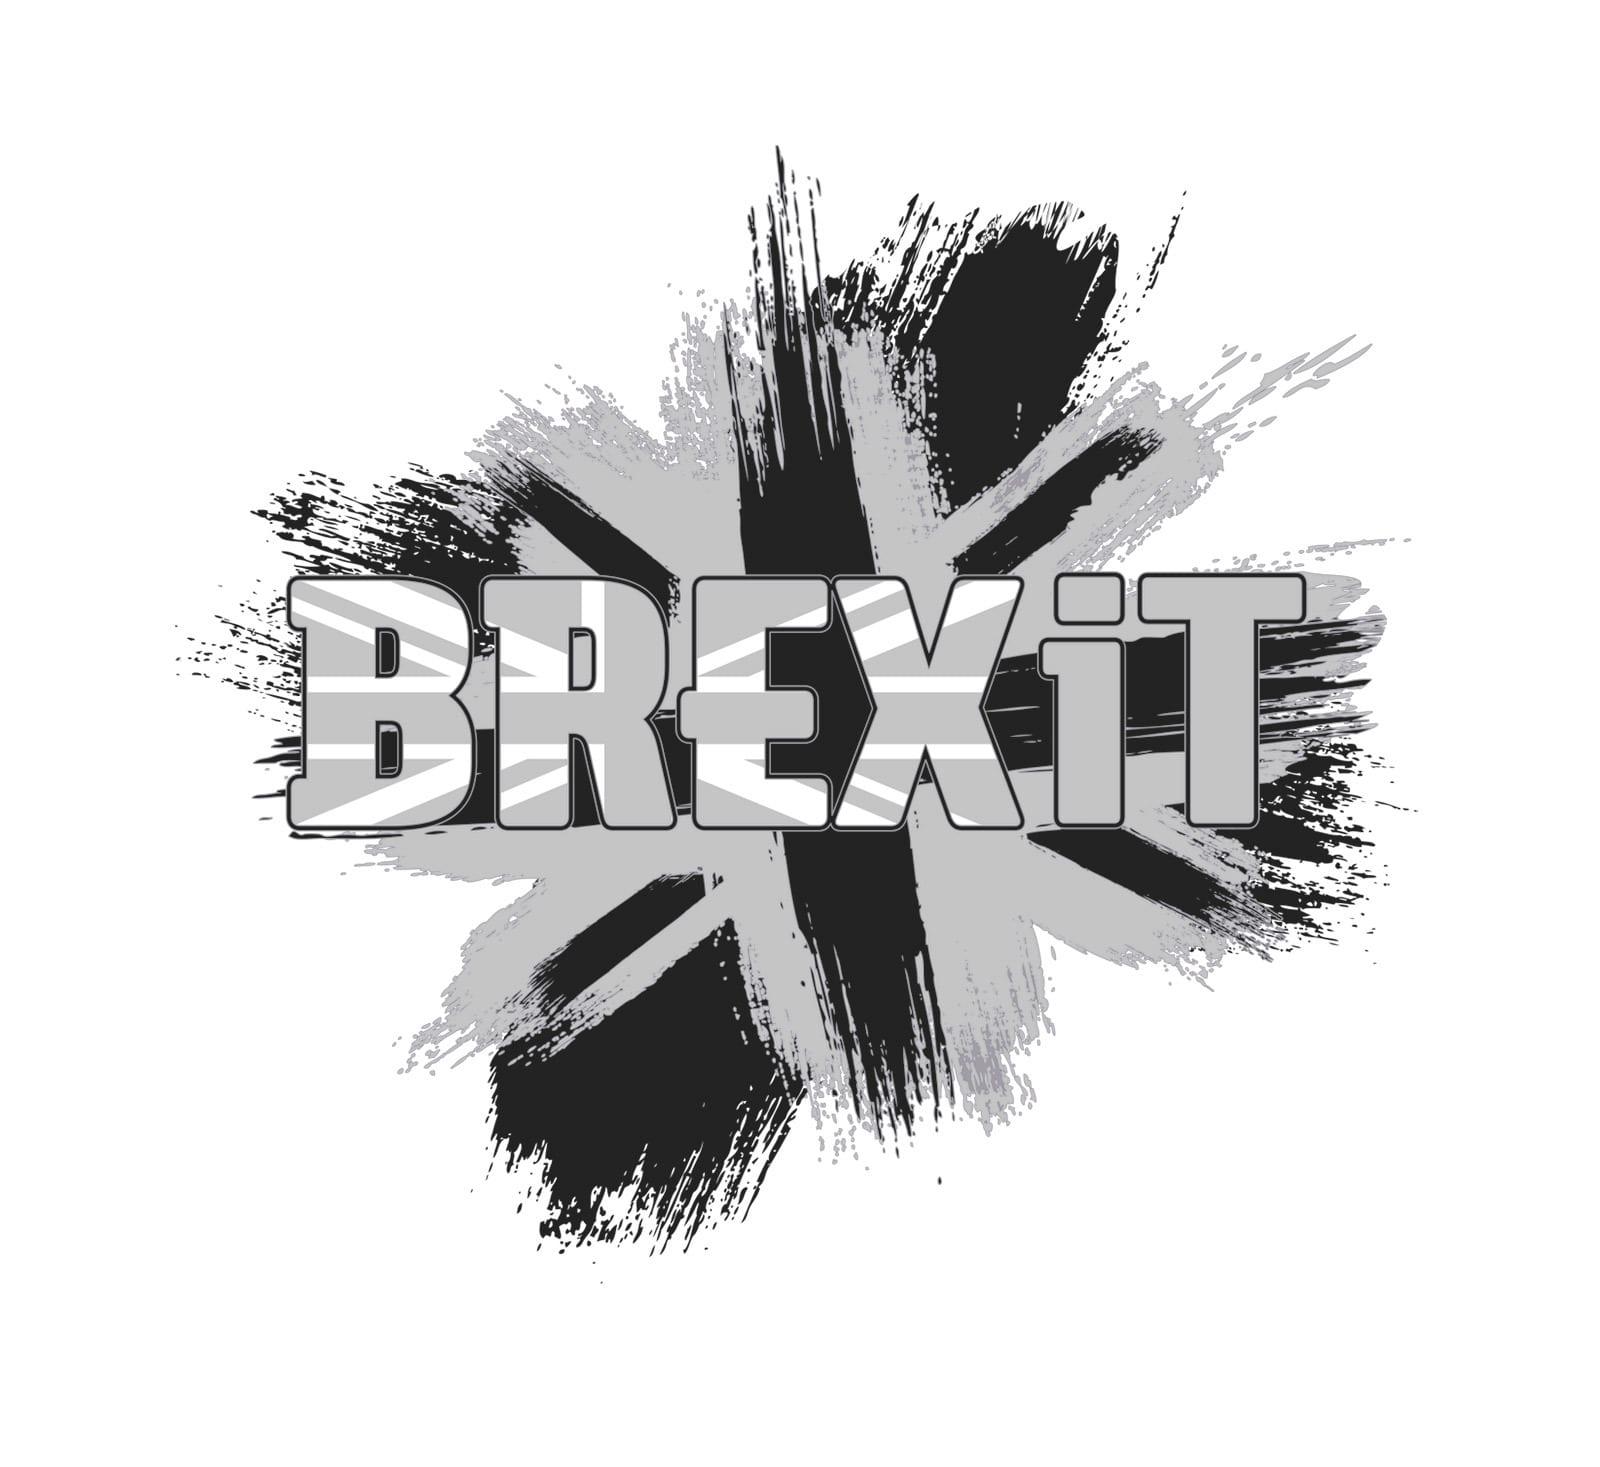 brexit-energy-drink-eu-trademark-application-brexit